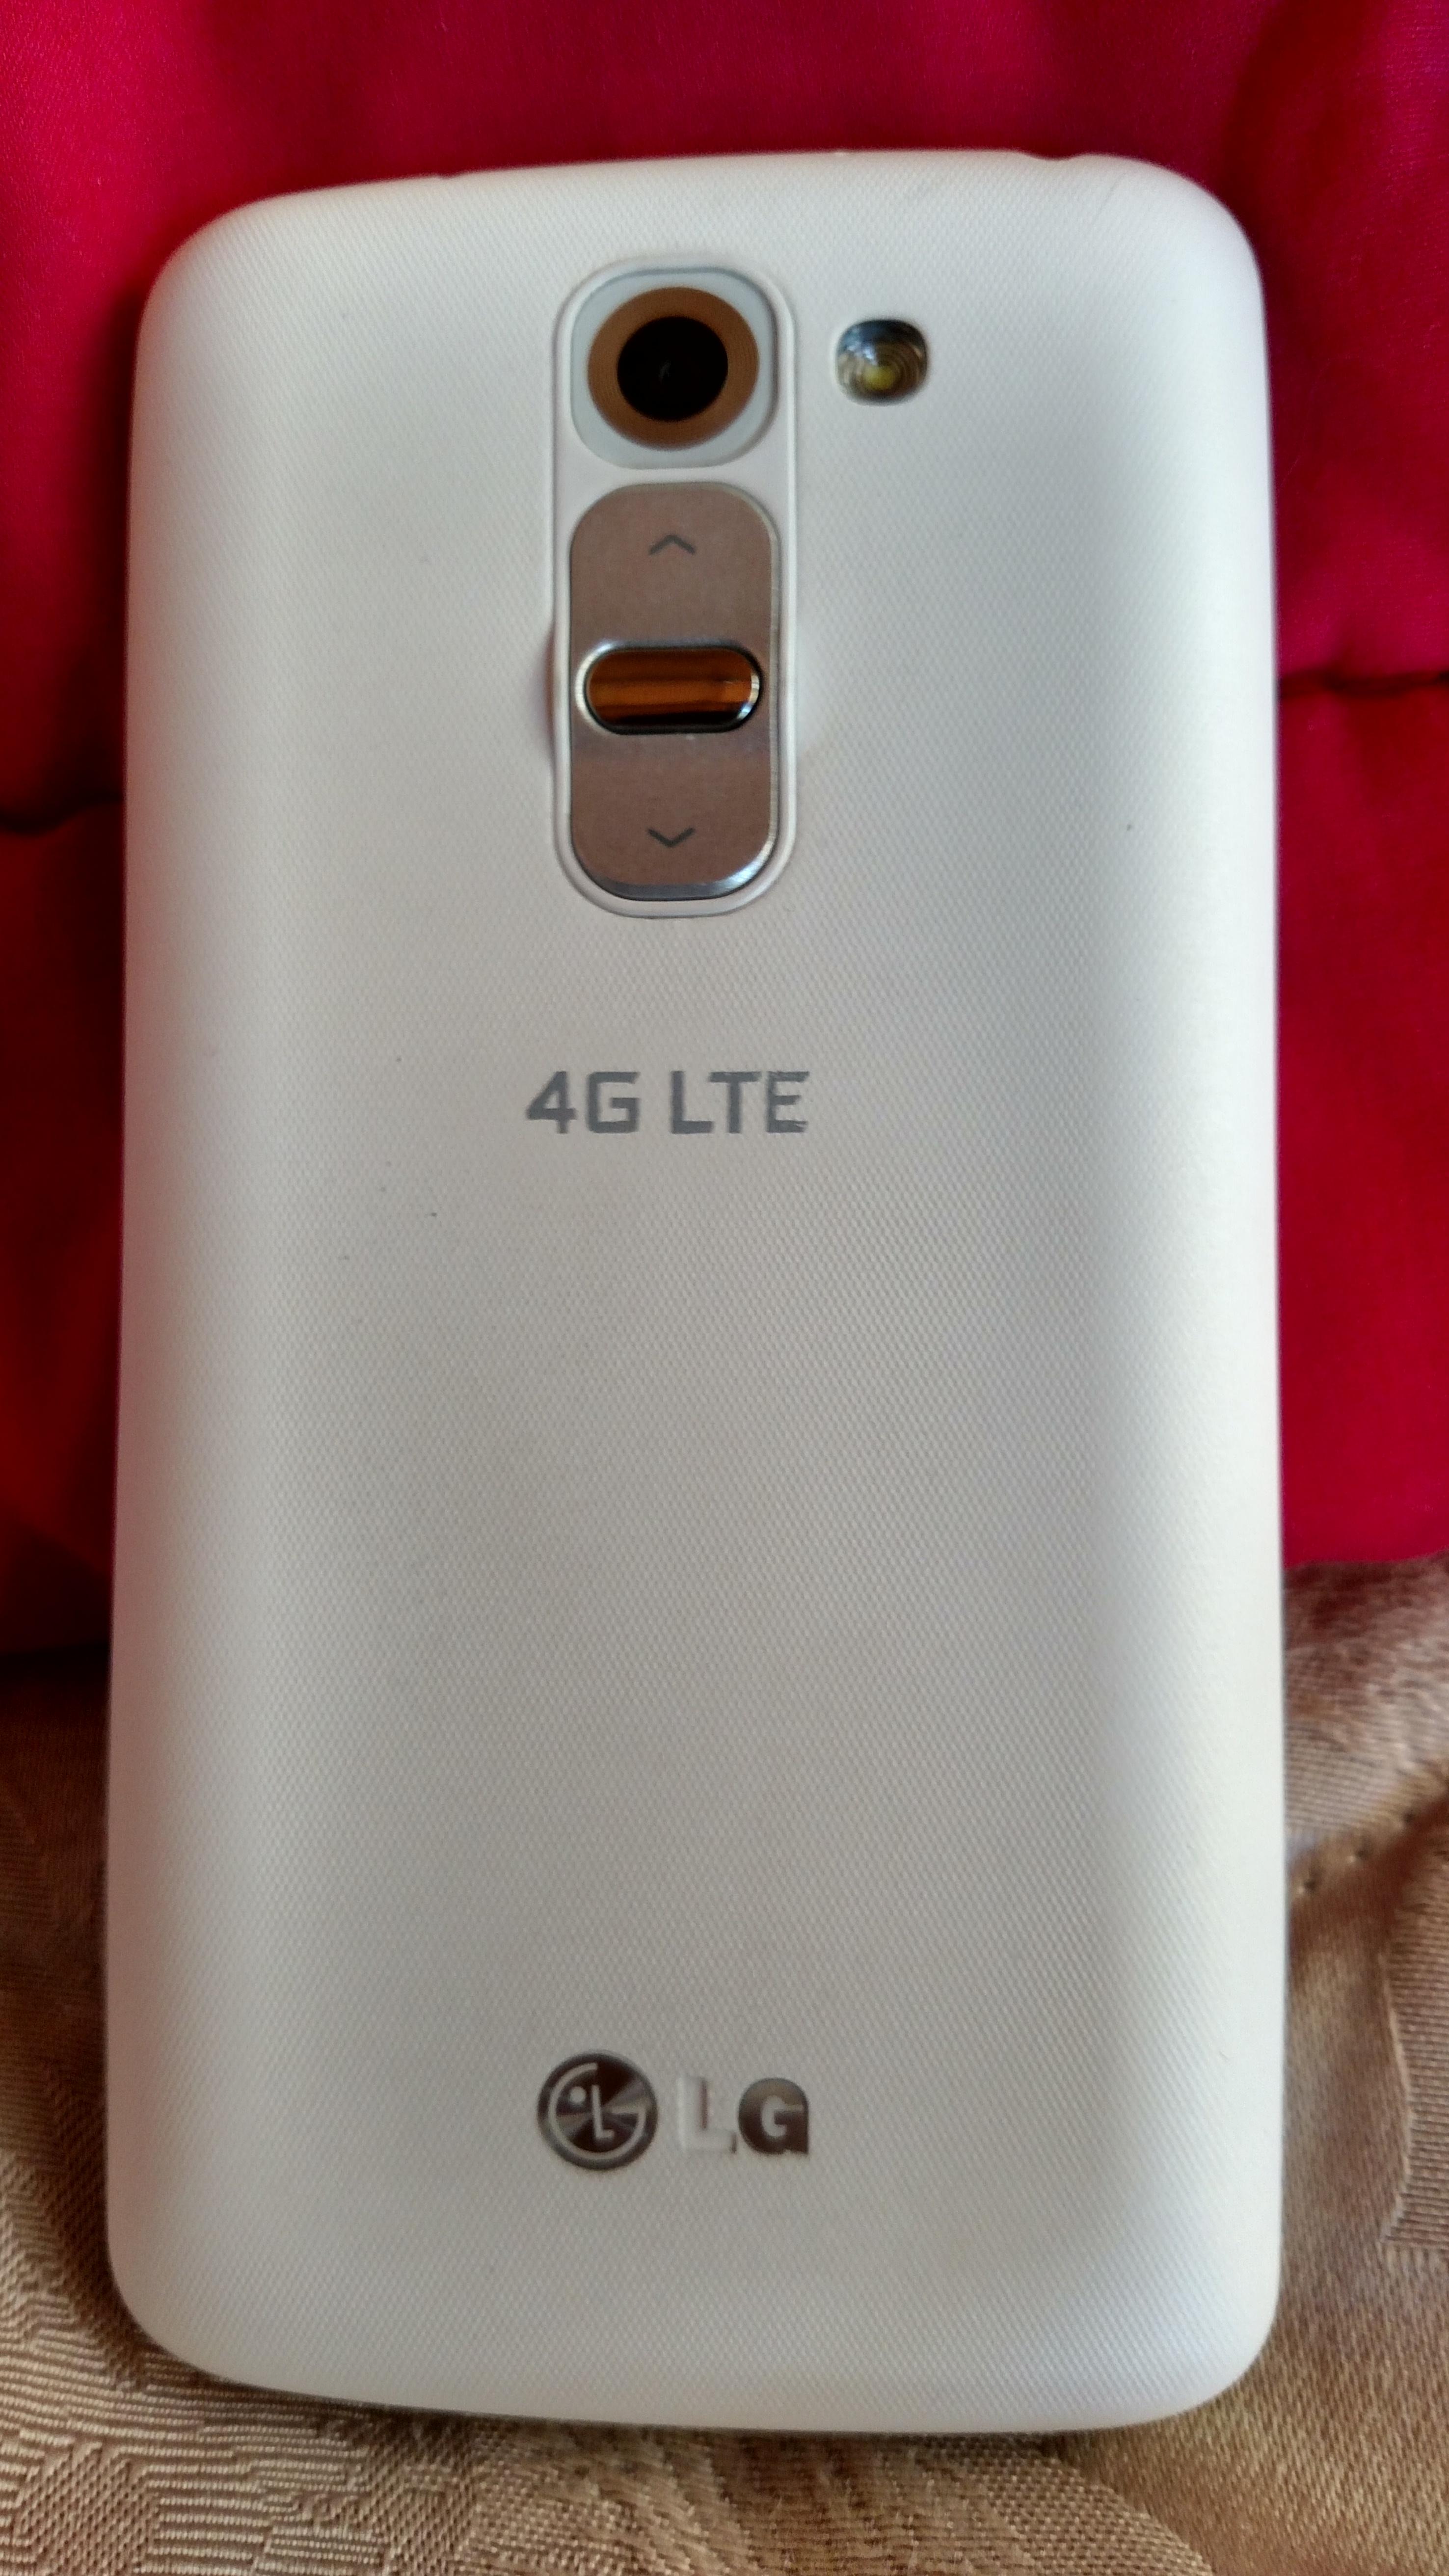 282225712fd VENTA] Lg G2 mini 4G LTE!! modelo D625